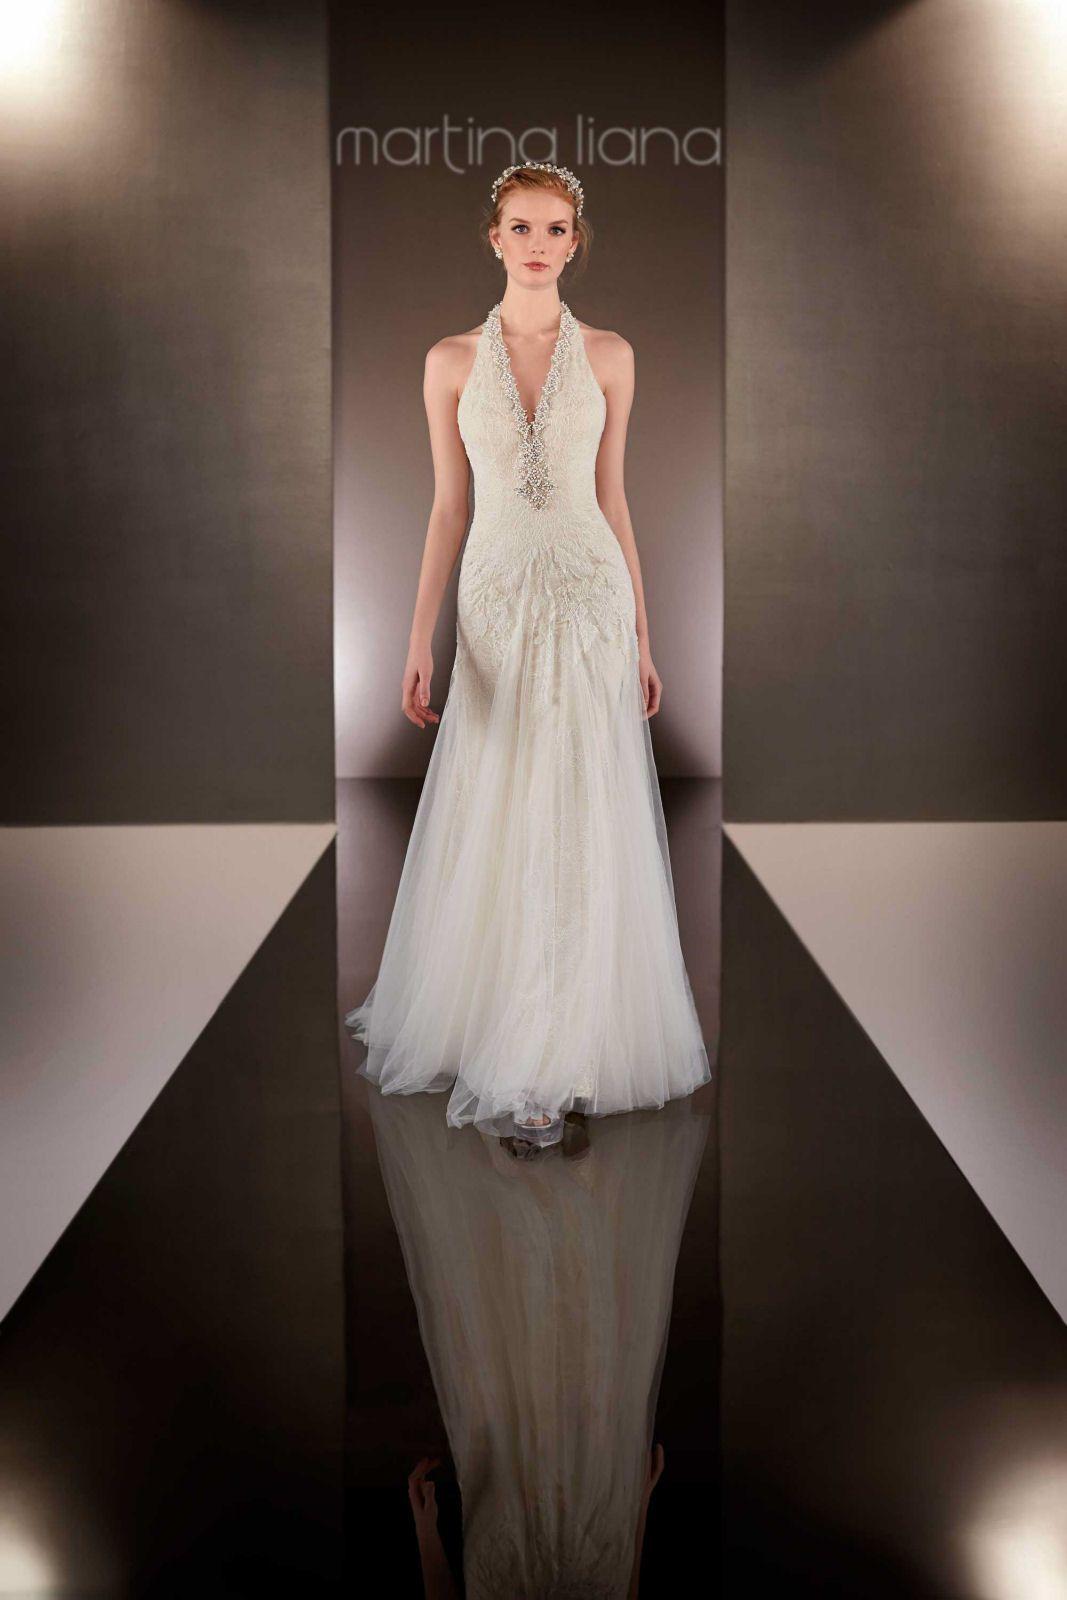 Silk sheath wedding dress   from Martina Liana  Wedding ideas  Pinterest  Wedding dress